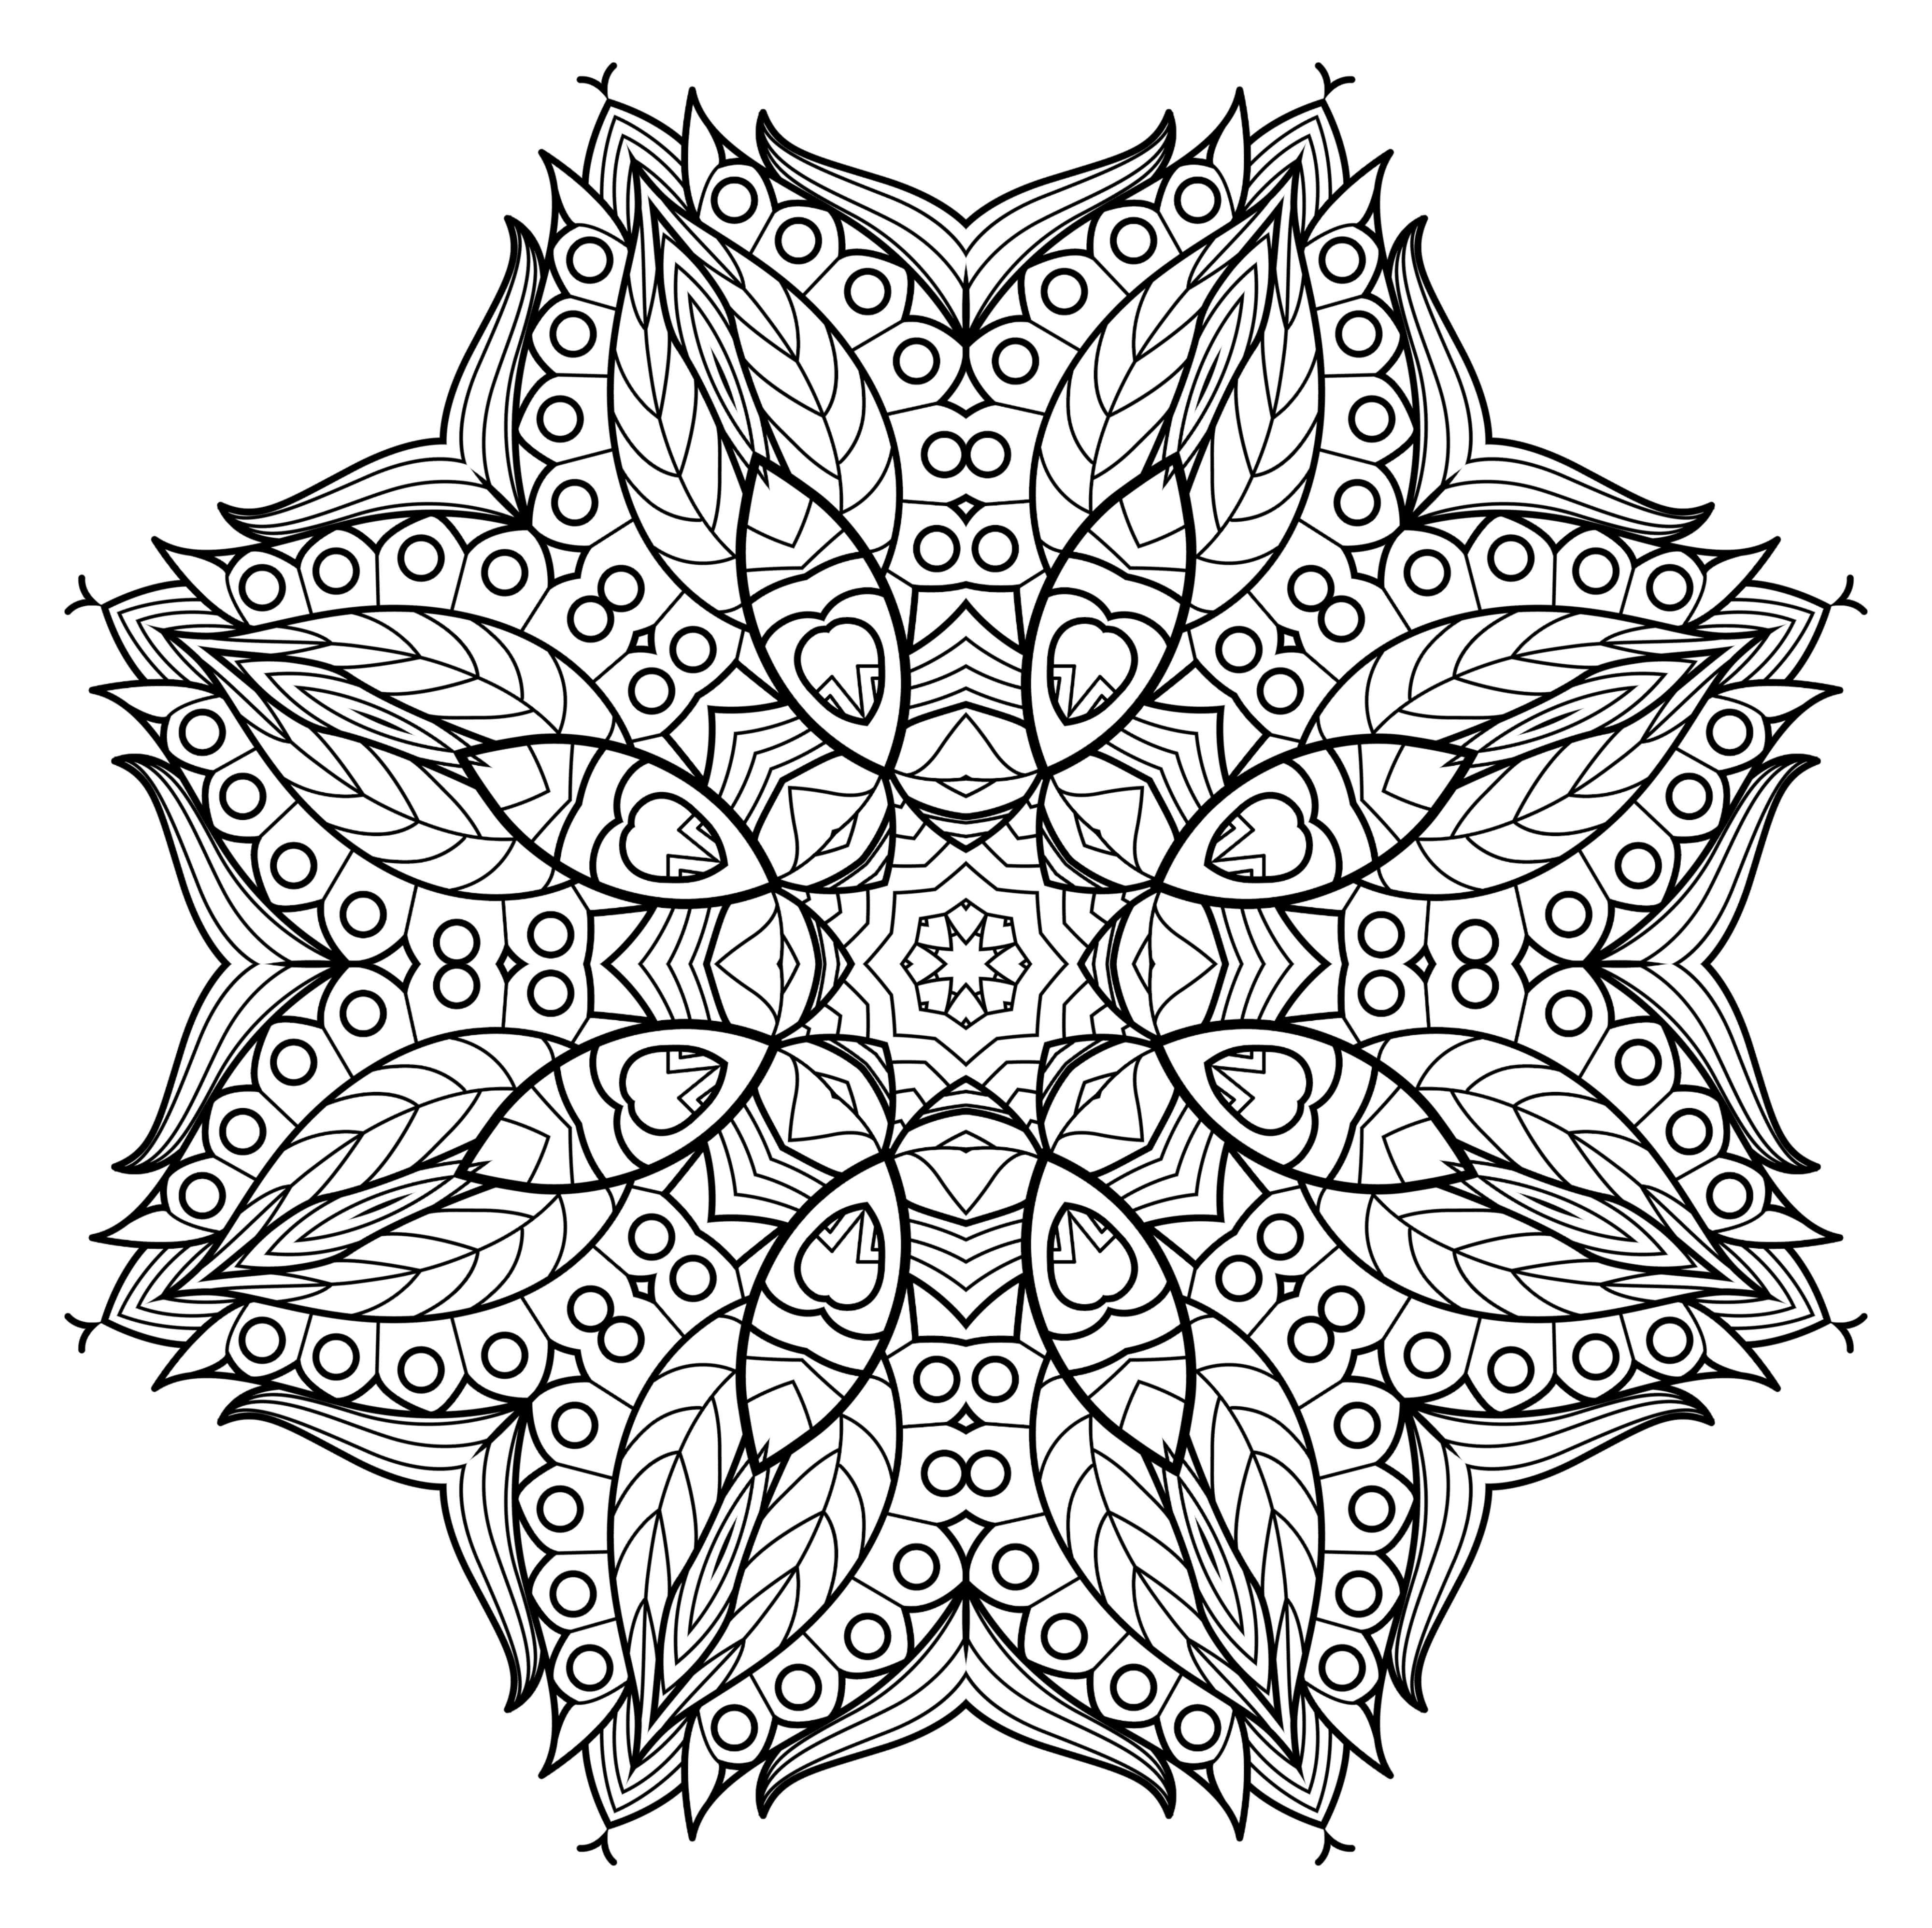 Lifestyle And Productivity The Maven Circle Mandala Kleurplaten Kleurplaten Mandala